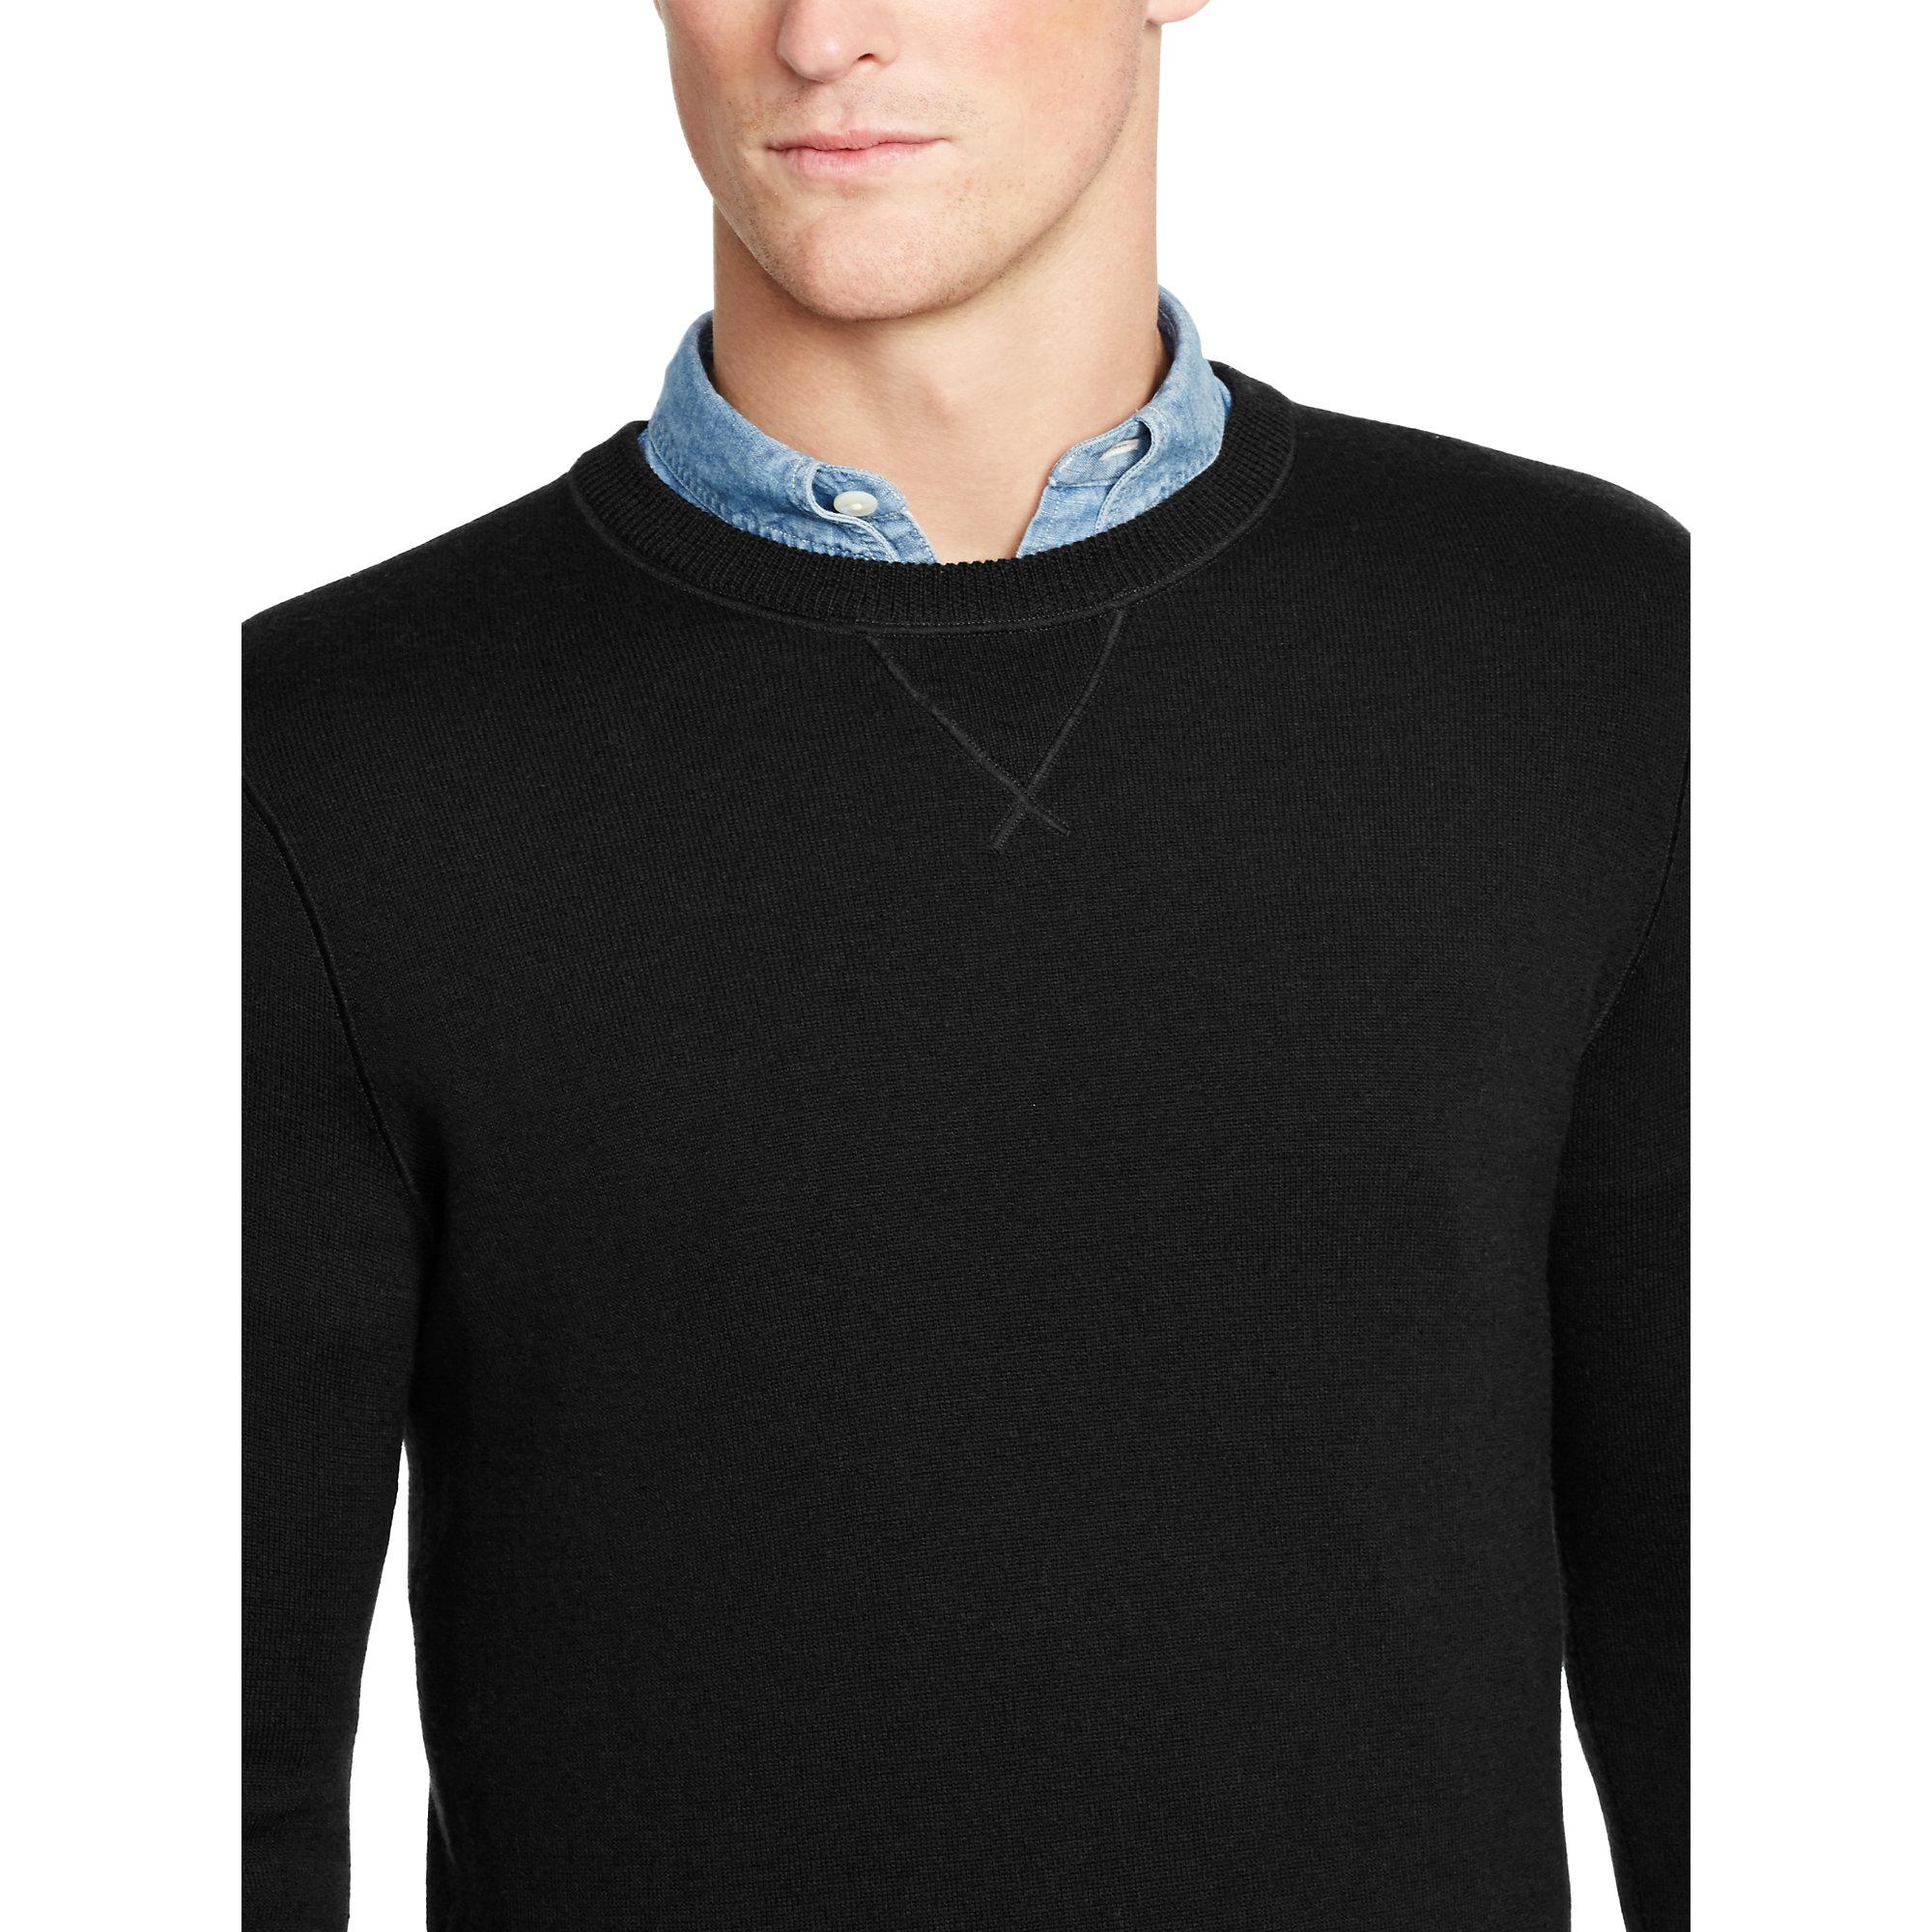 e68eb3c3a55c6c Polo Ralph Lauren Merino Wool Crewneck Sweater in Black for Men - Lyst